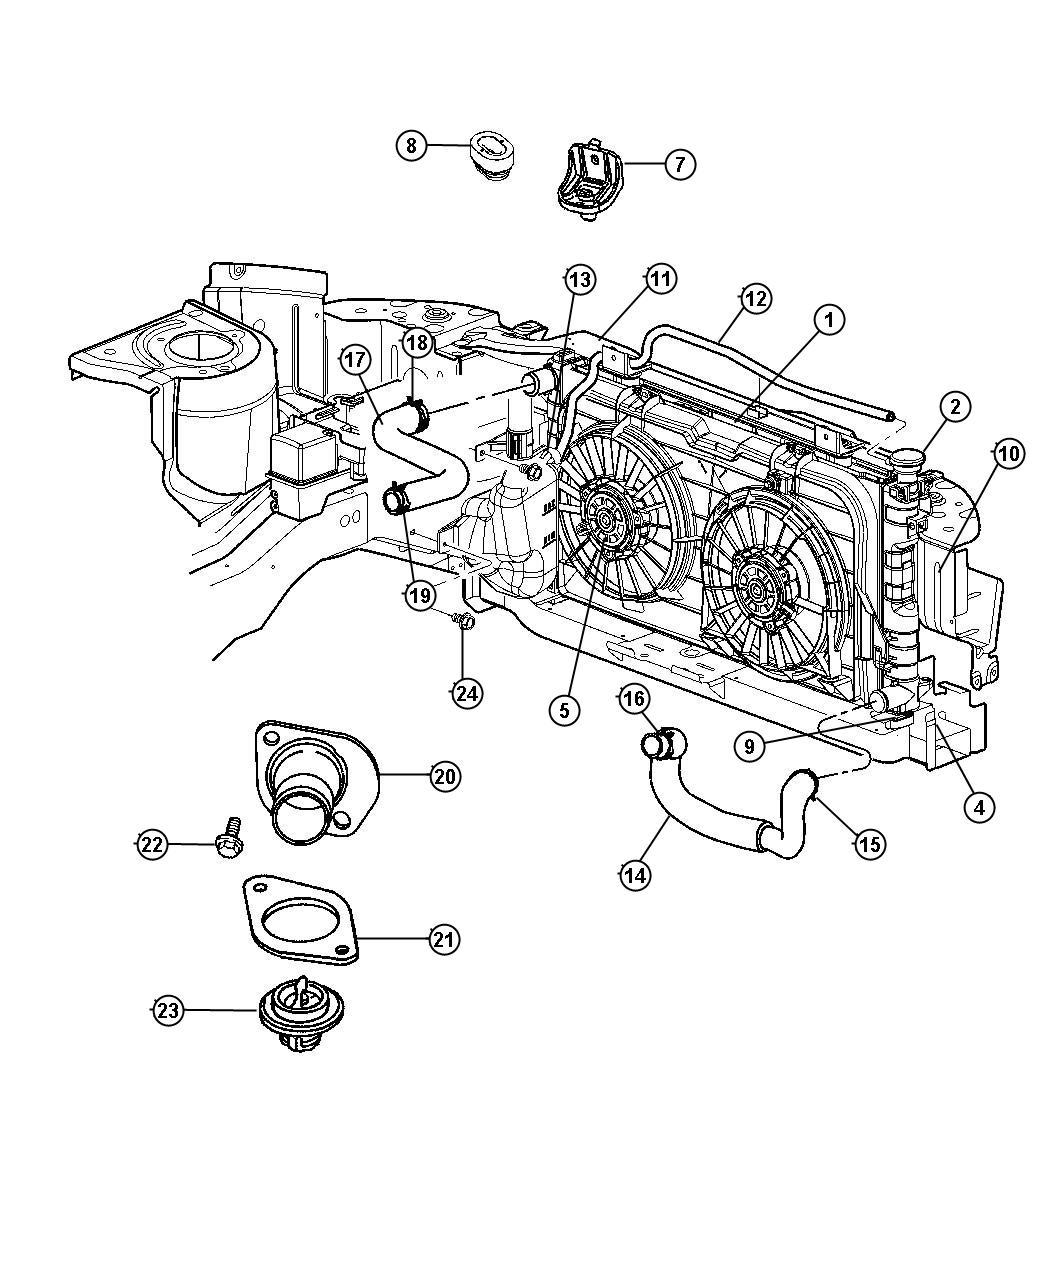 Dodge Caravan Housing Thermostat